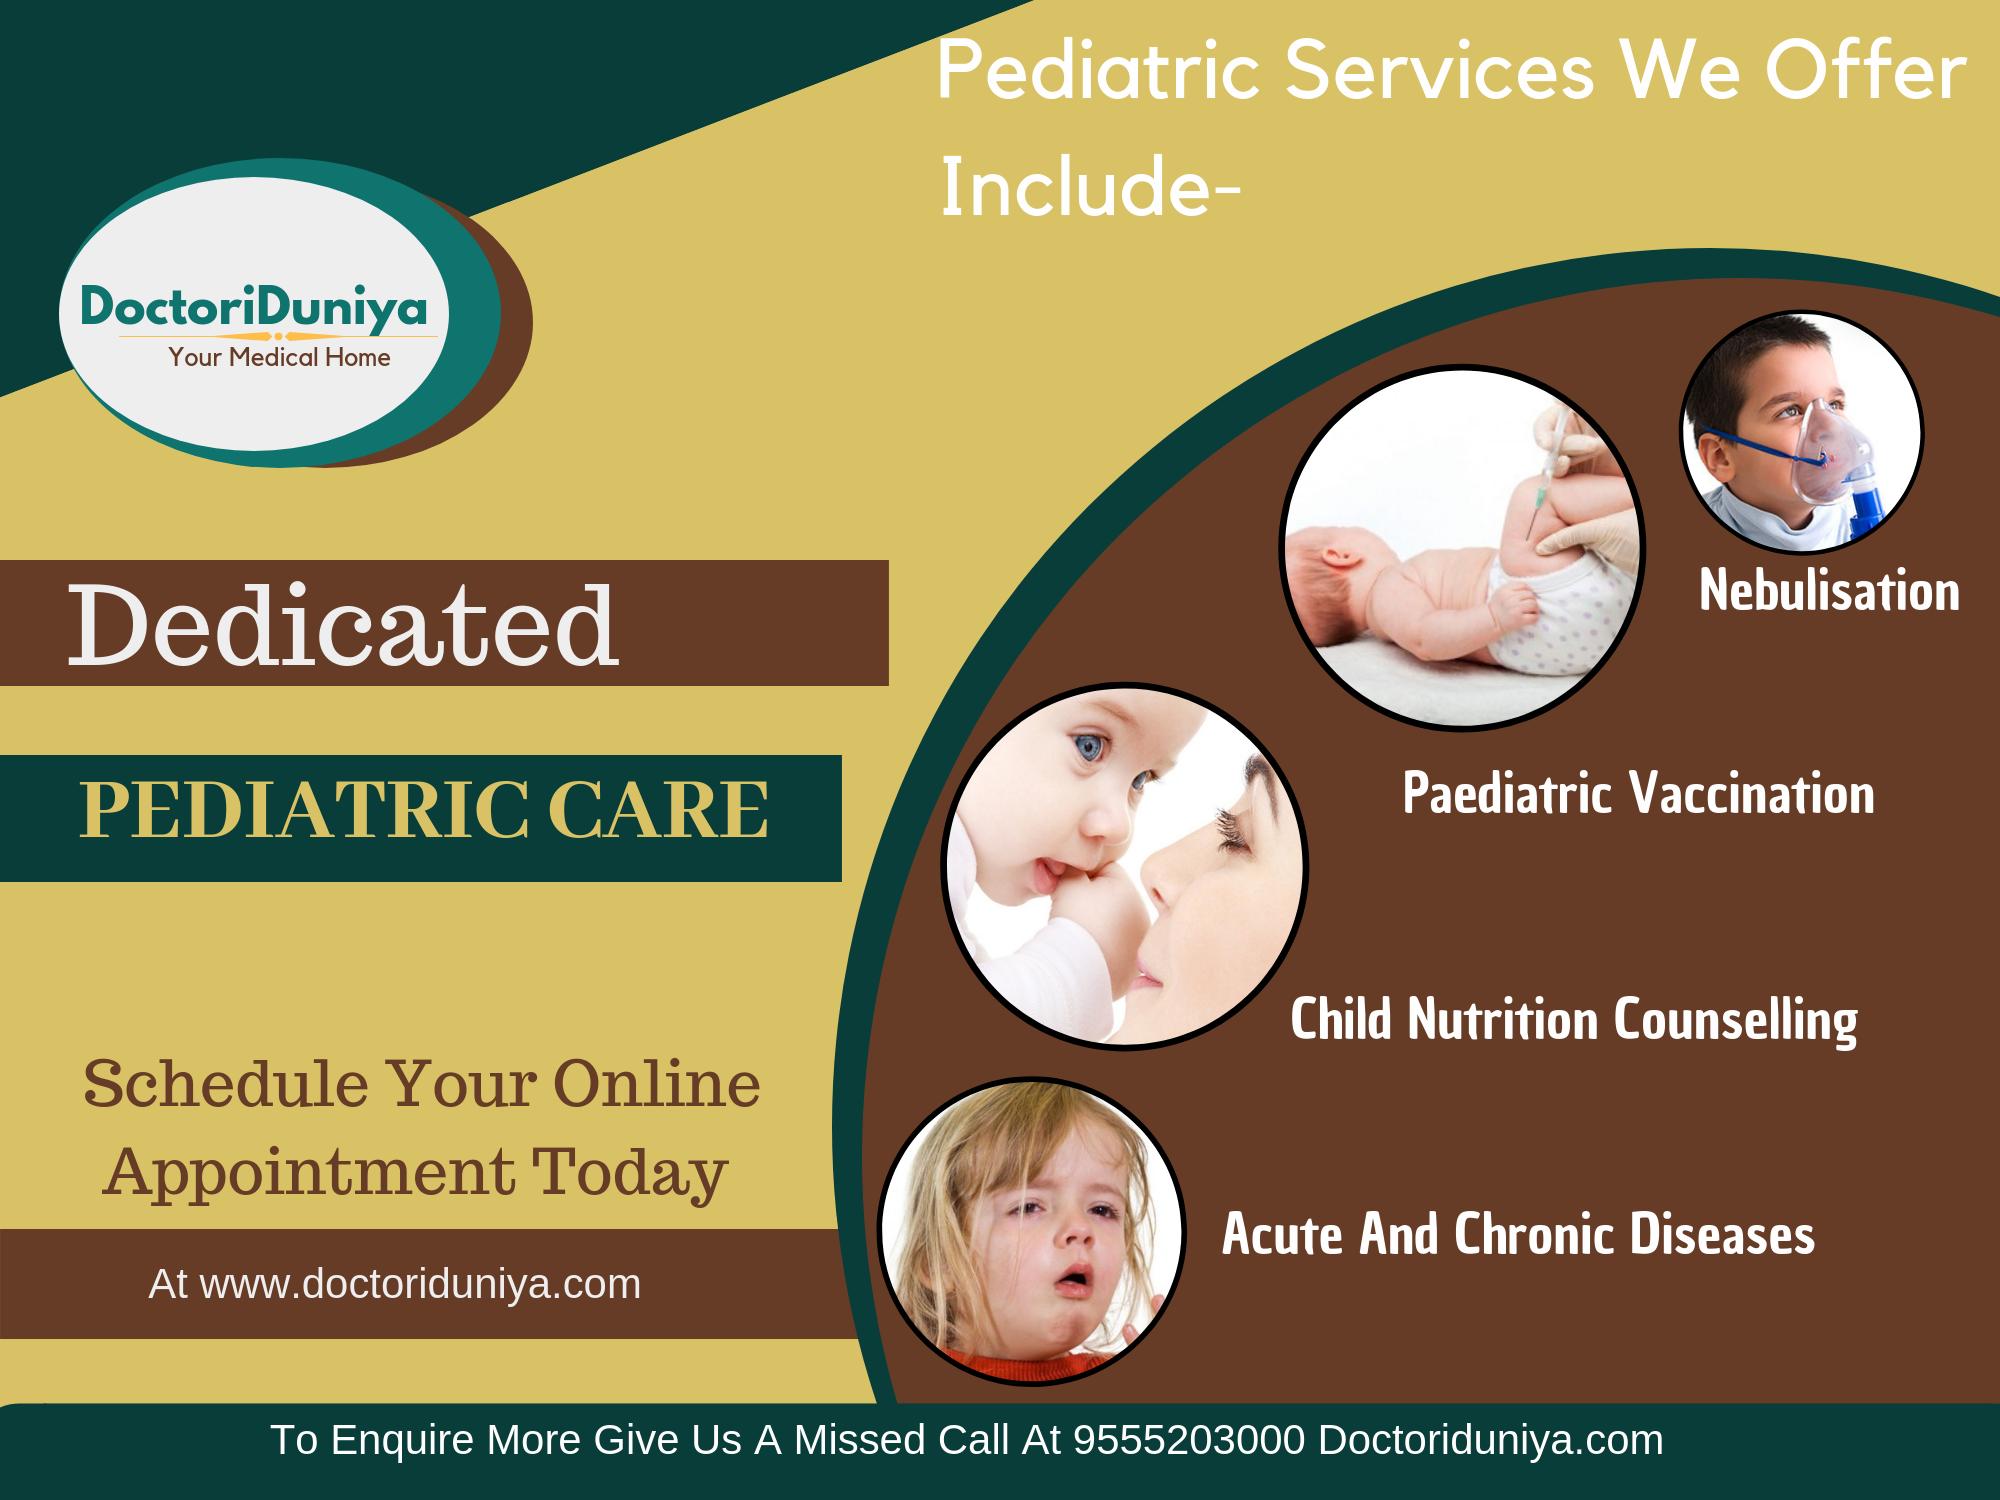 Doctoriduniya Pediatric Care Kids Nutrition Pediatrics